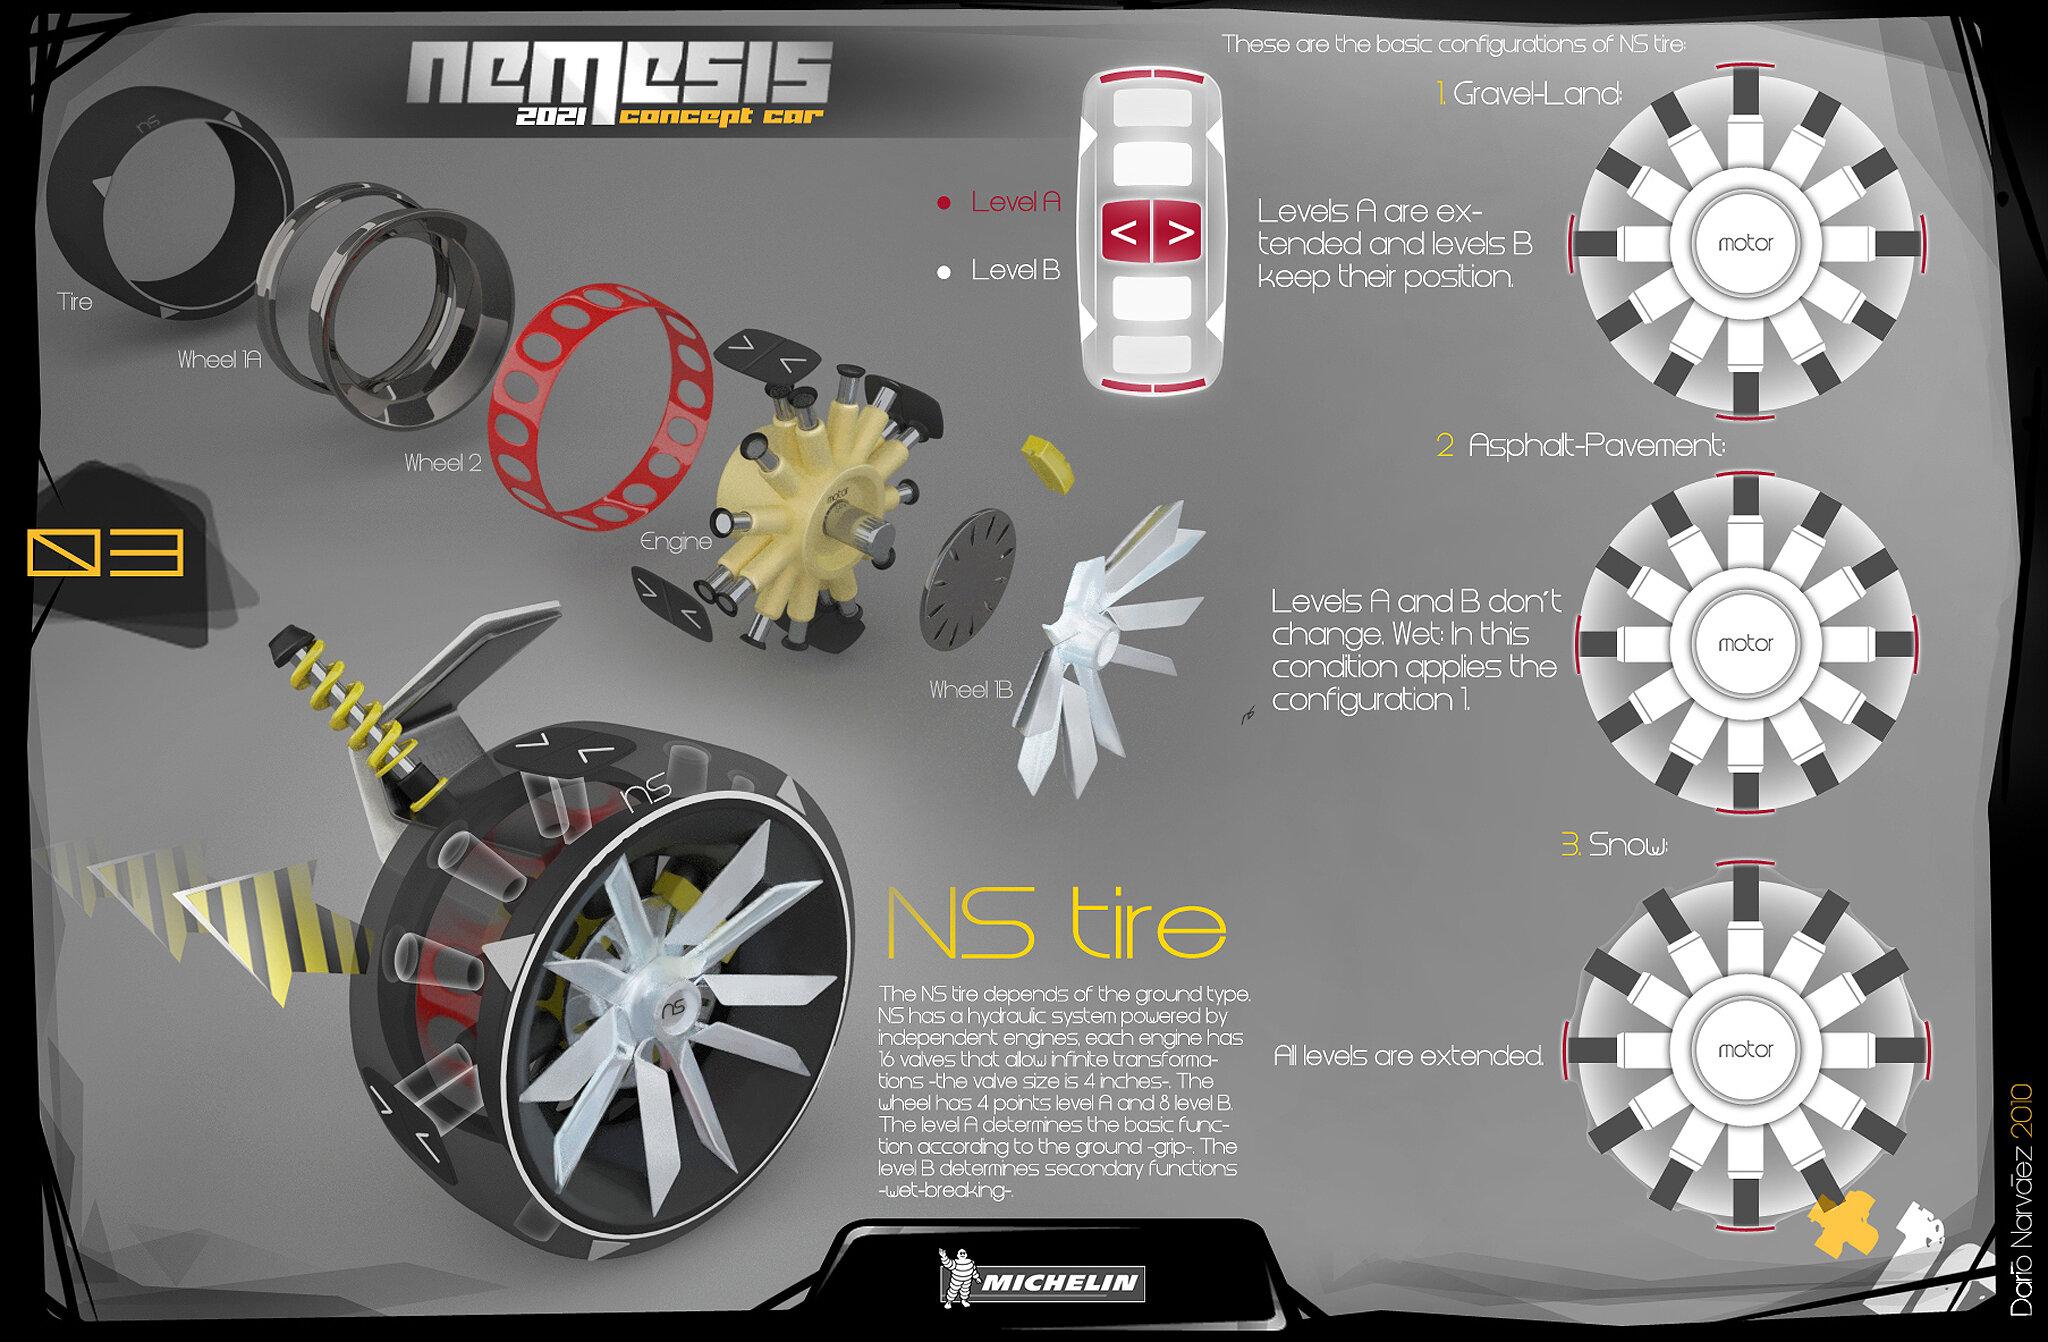 Nemesis_concept_car_final_04_source.jpg